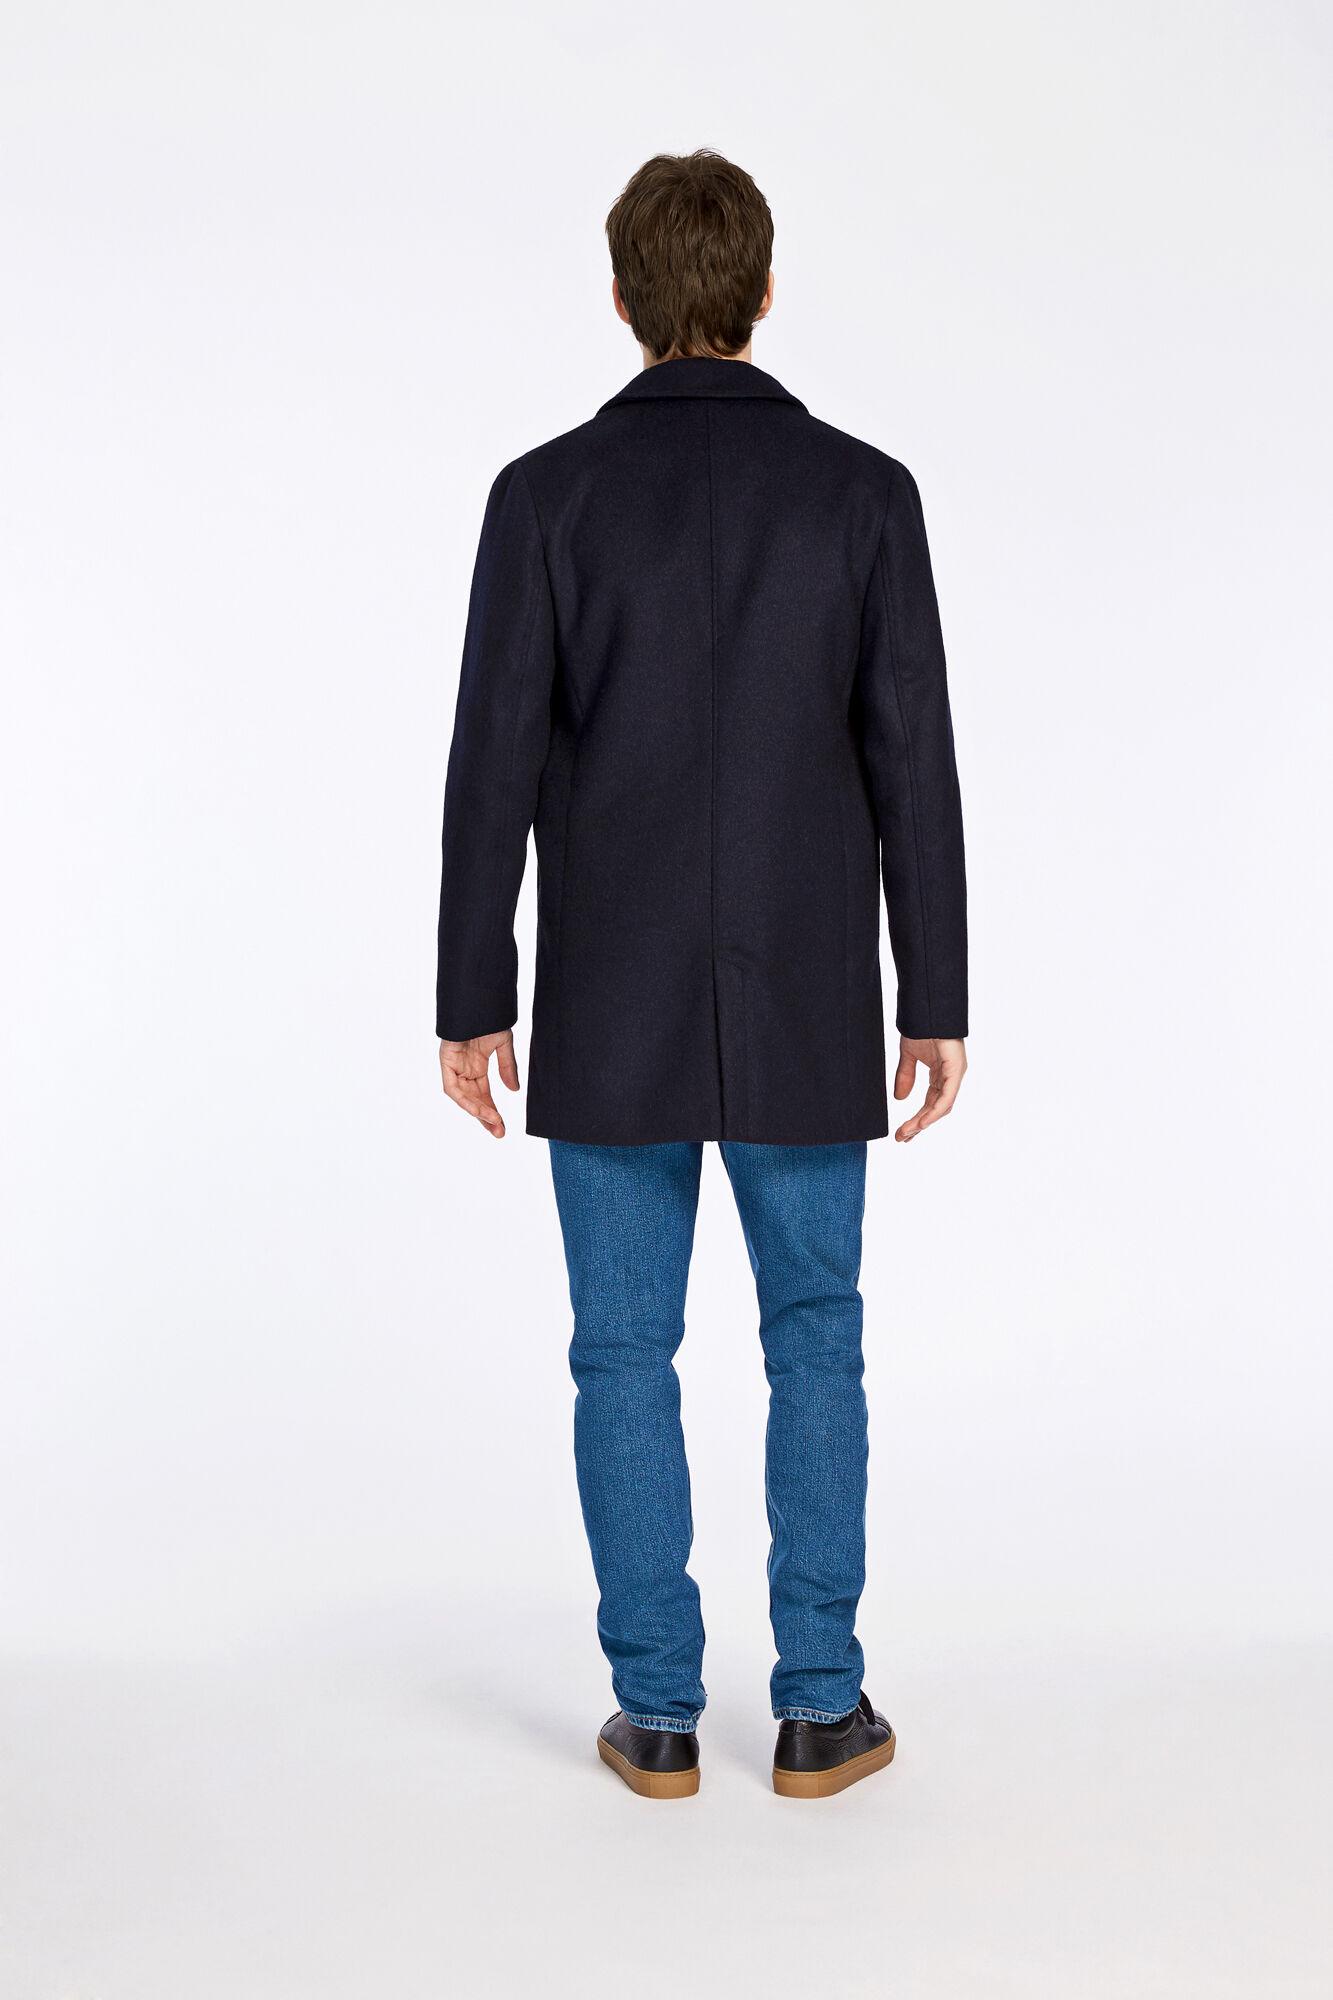 Kenpo jacket 4011, 4011 DARK BLUE MELANGE